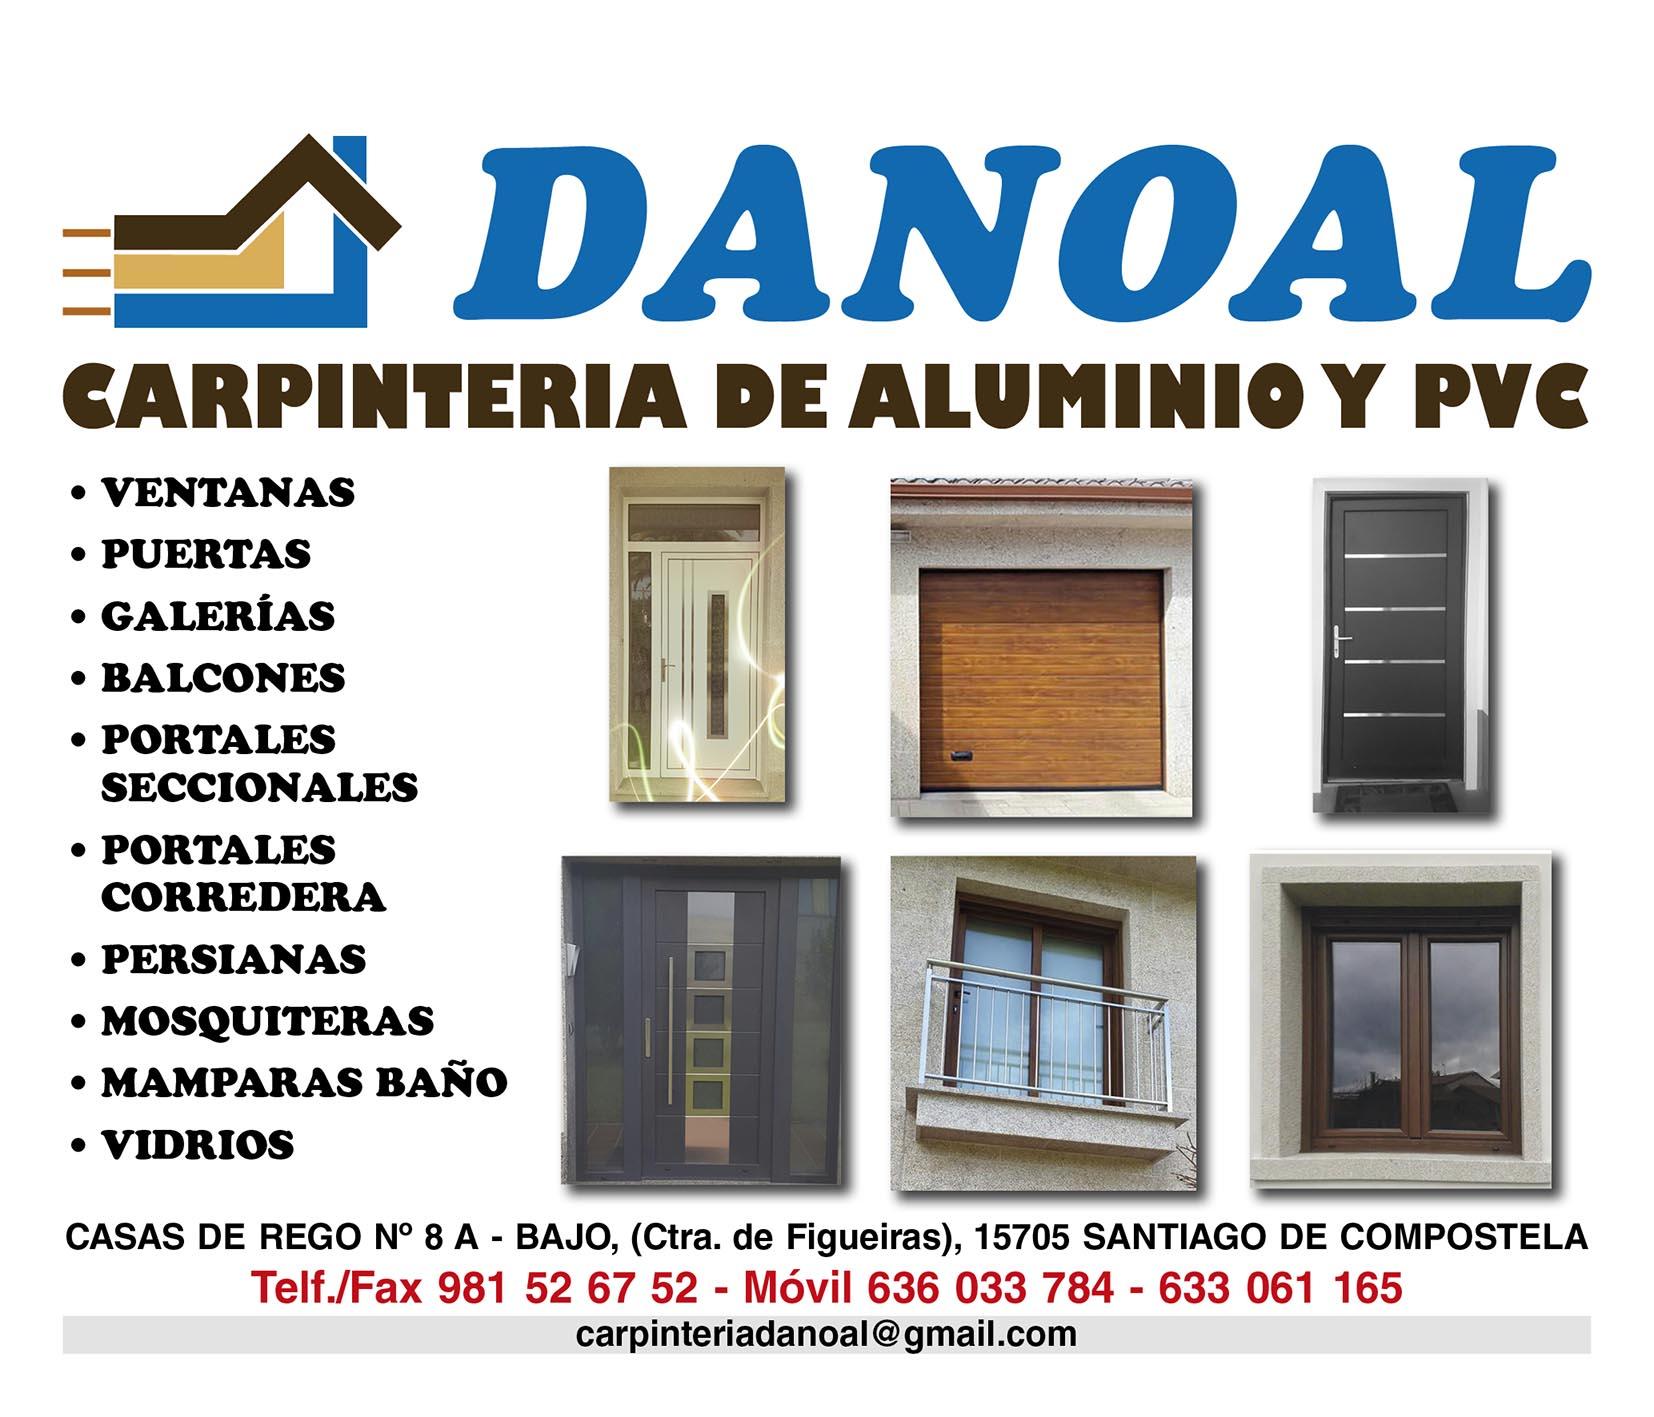 Danoal